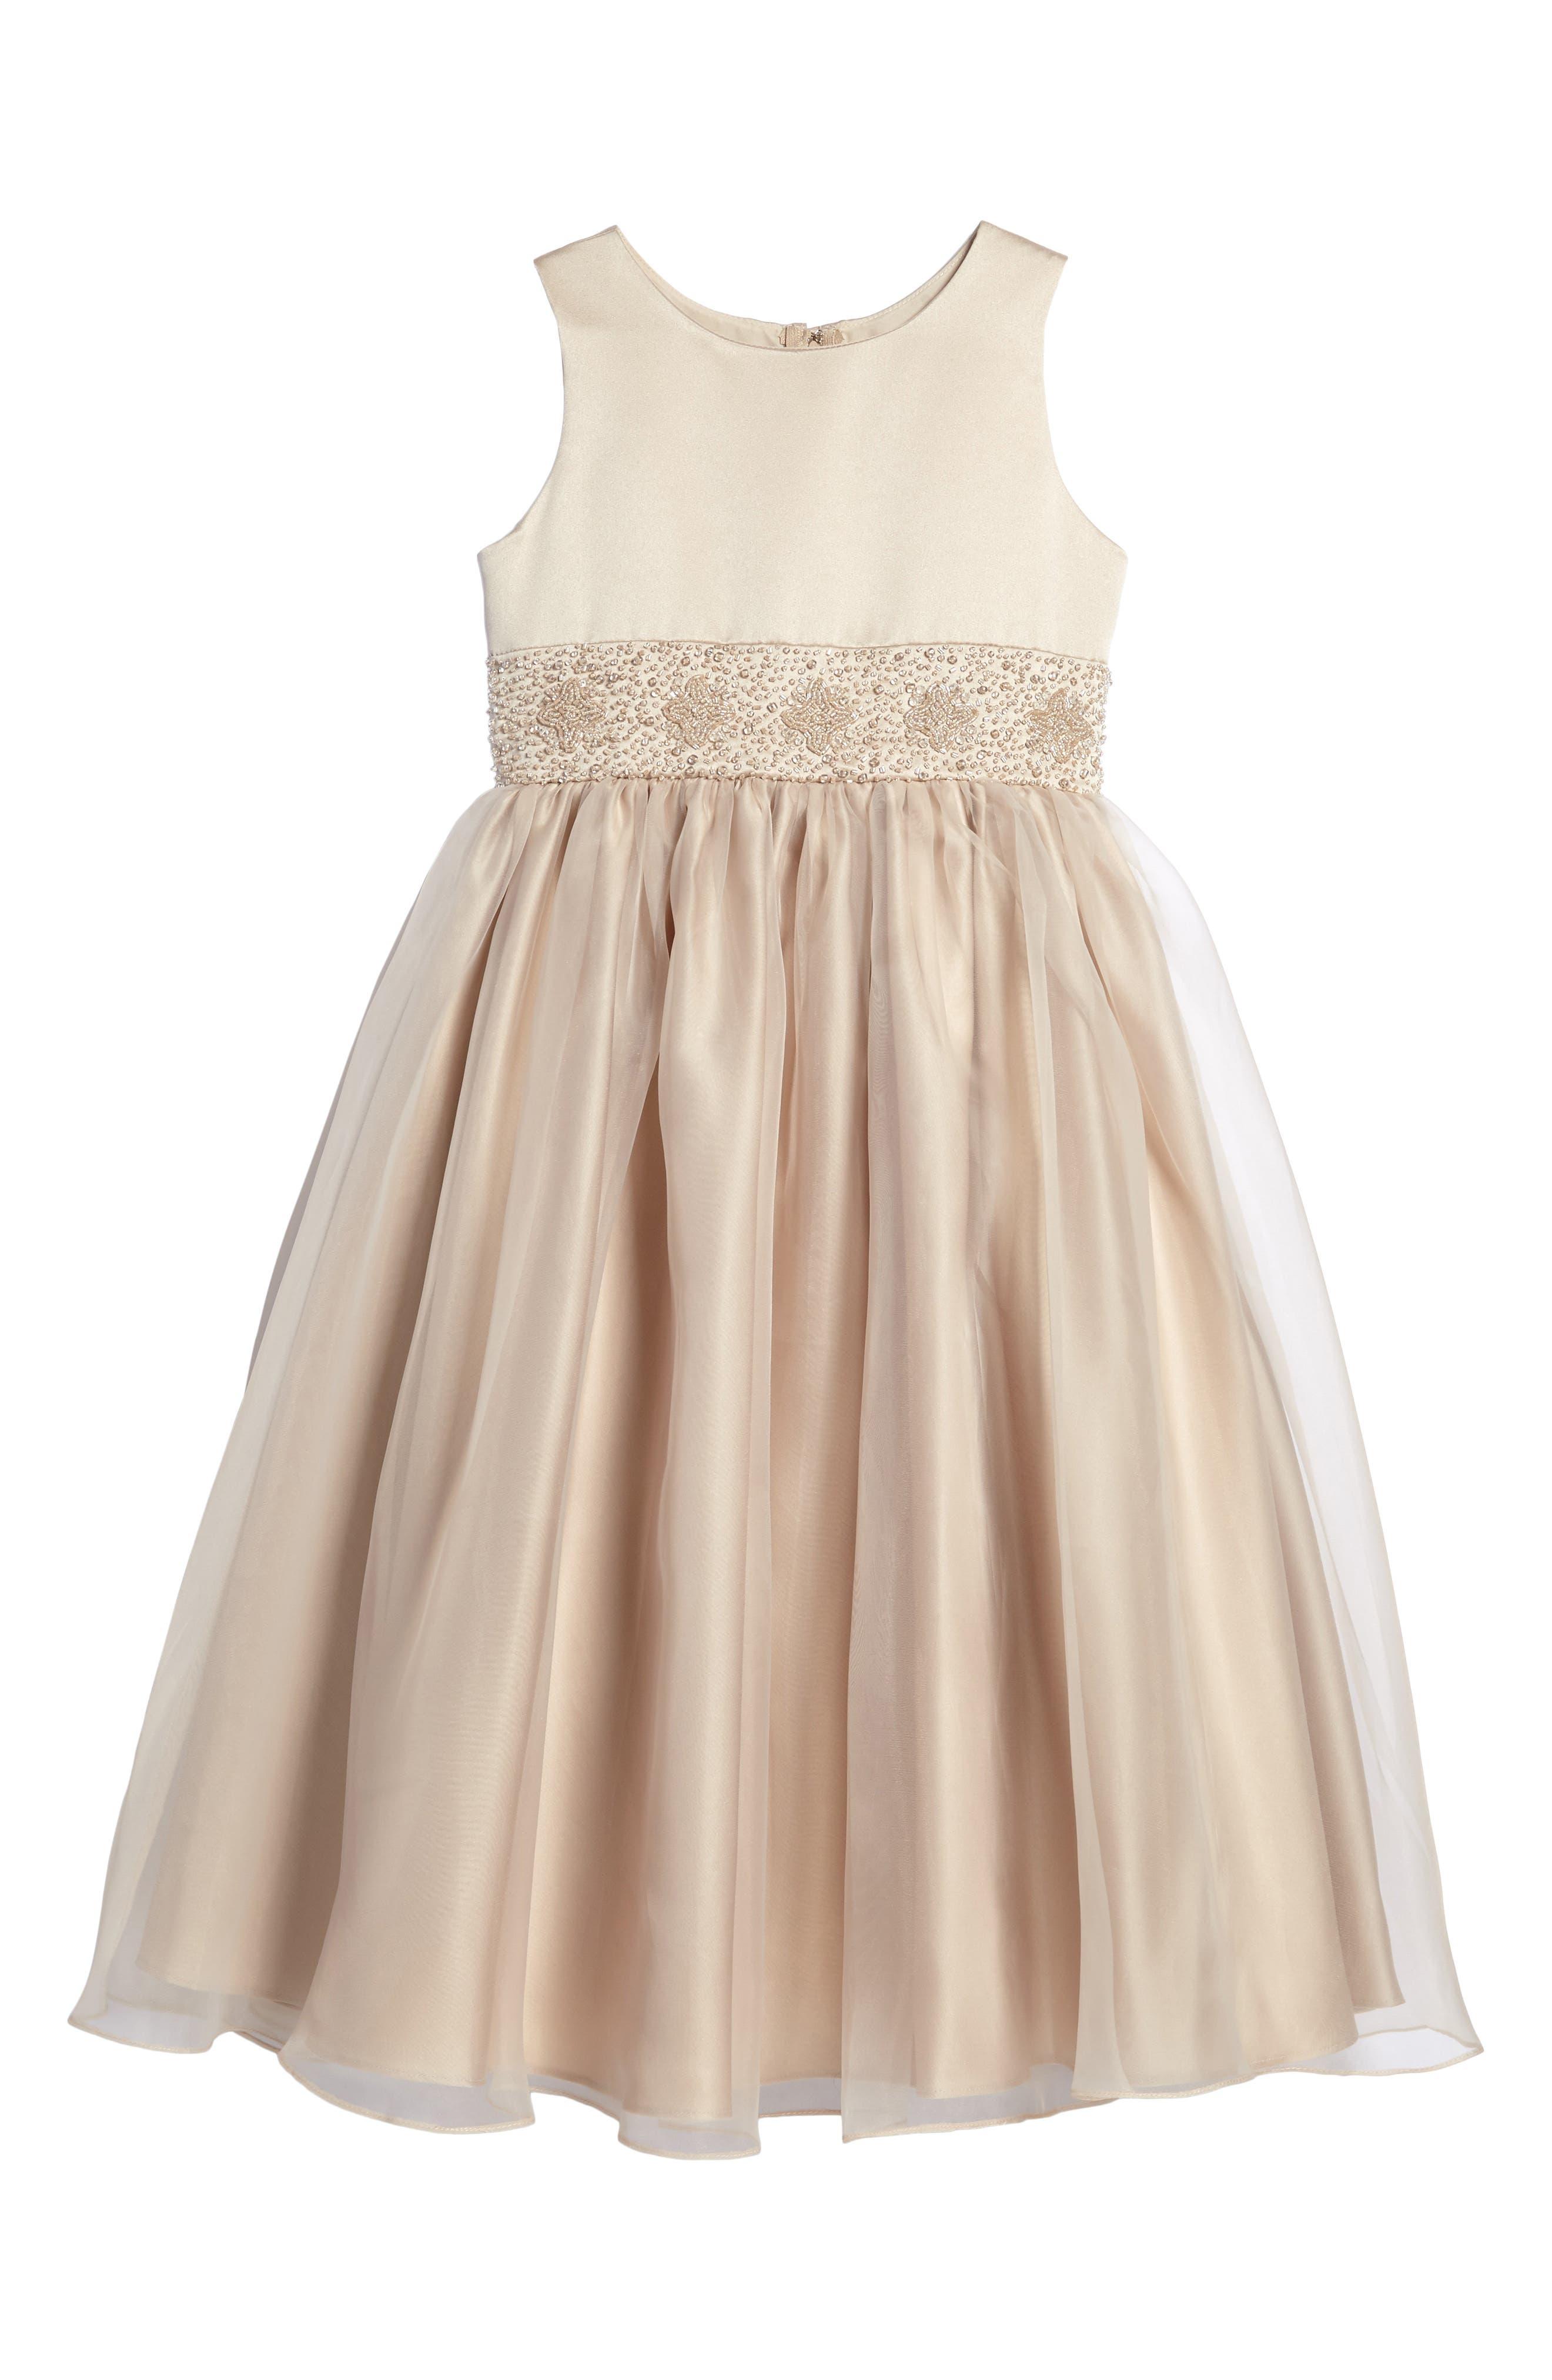 Beaded Satin Sleeveless Dress,                             Main thumbnail 1, color,                             CHAMPAGNE